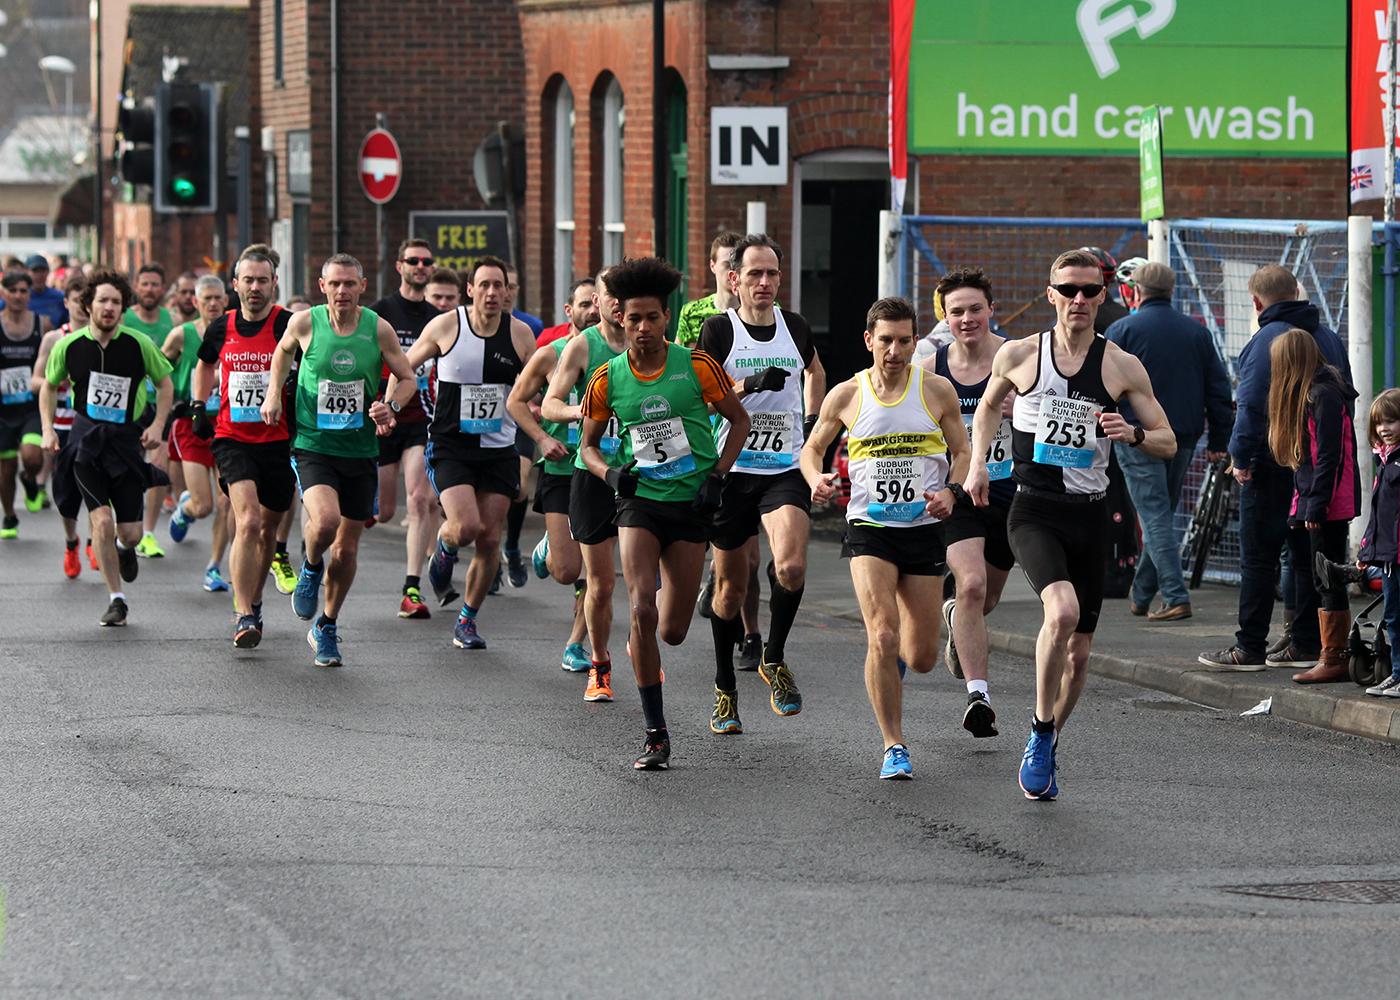 Sudbury Fun Run 2018, the start